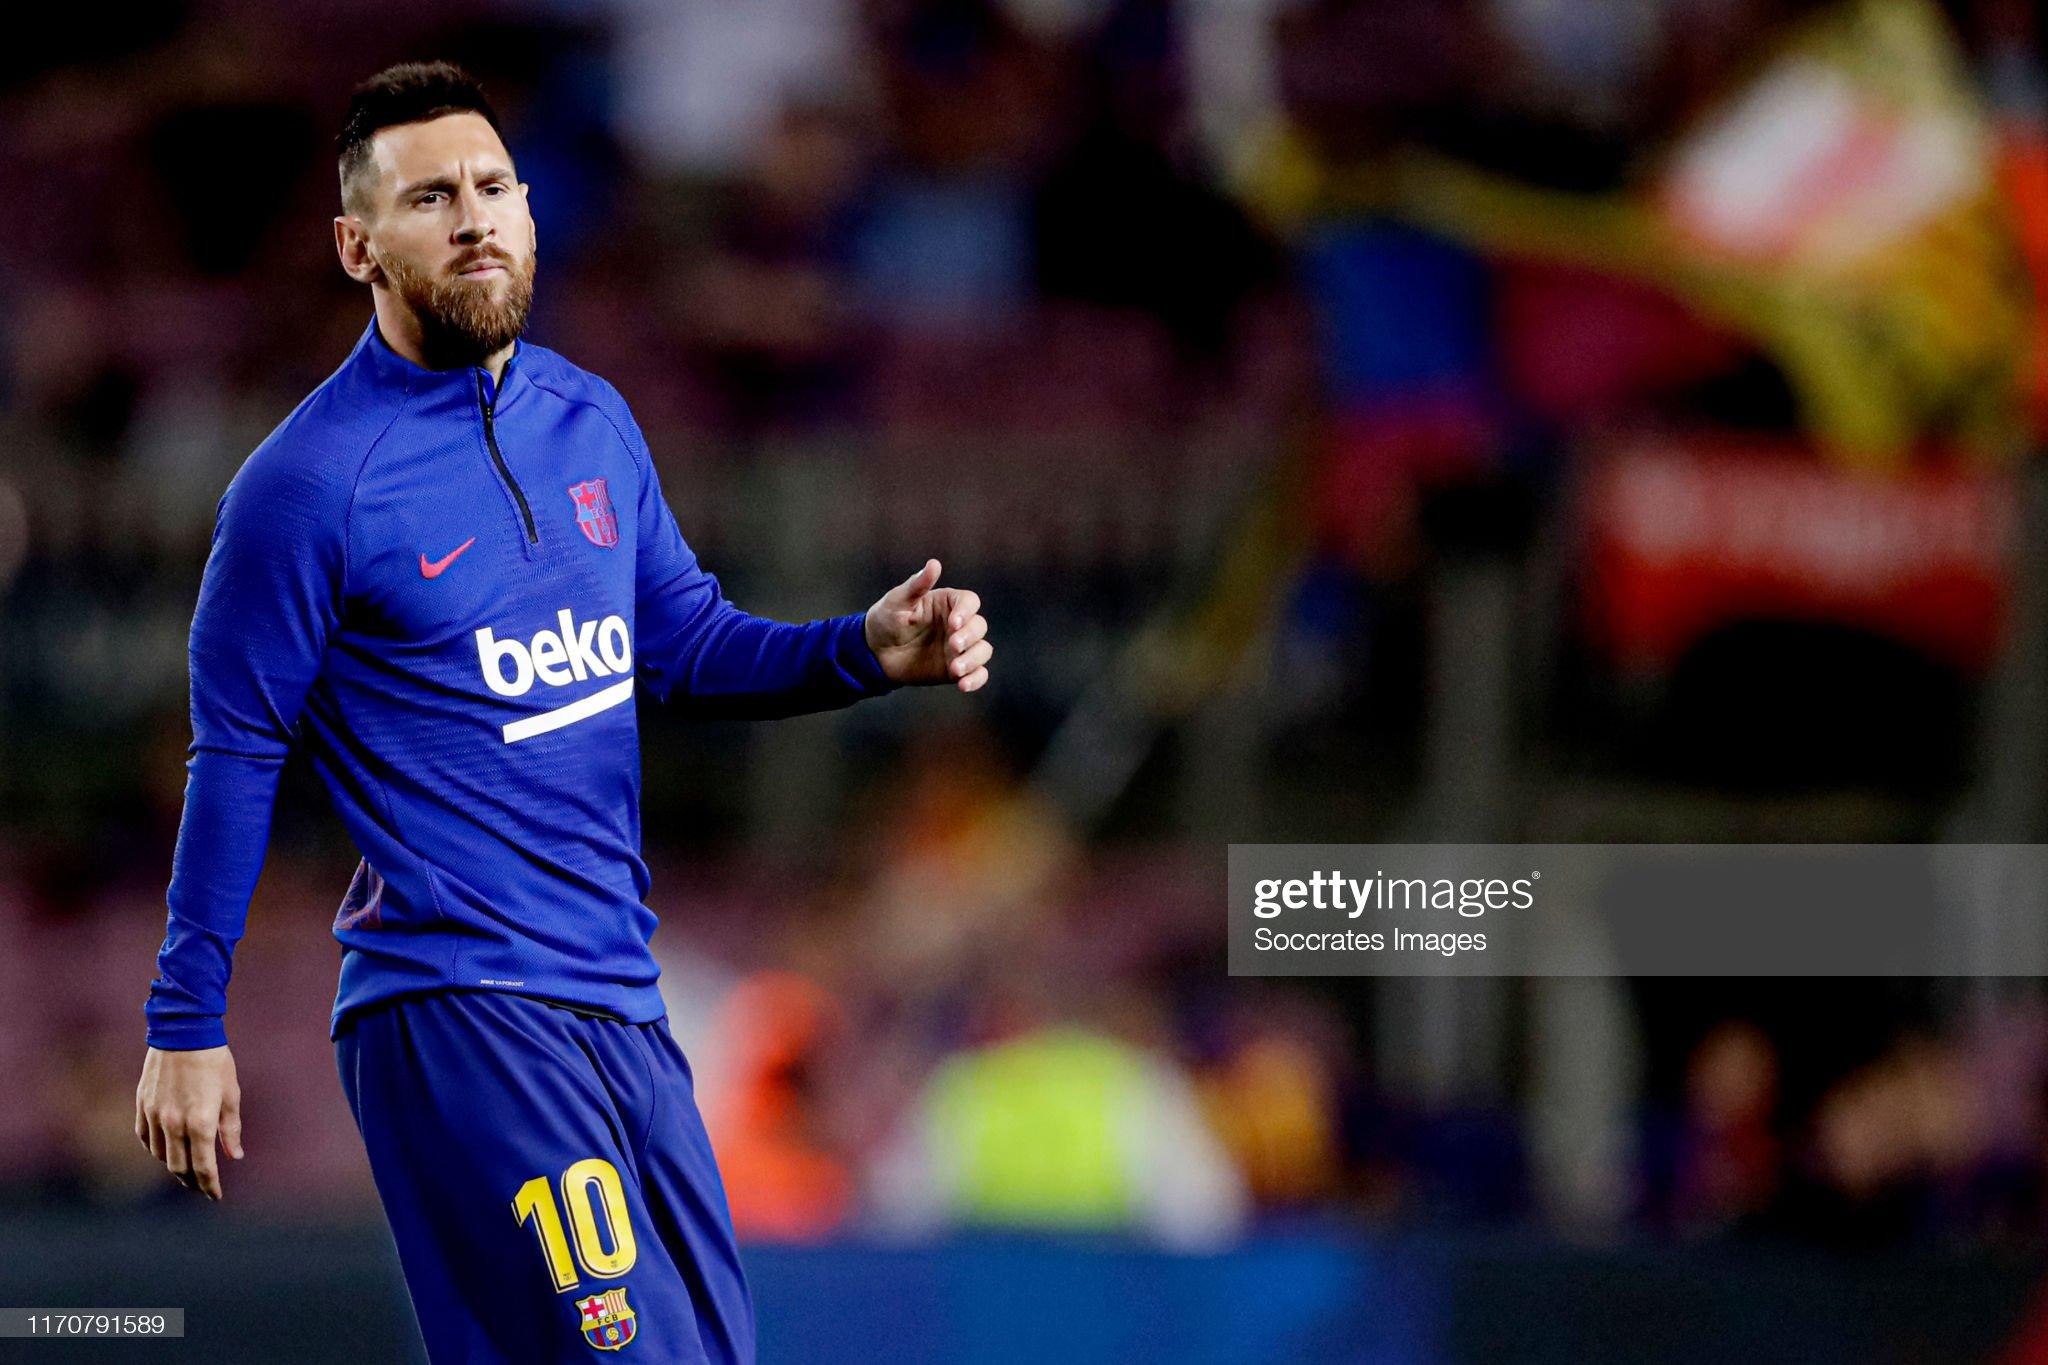 صور مباراة : برشلونة - فياريال 2-1 ( 24-09-2019 )  Lionel-messi-of-fc-barcelona-during-the-la-liga-santander-match-fc-picture-id1170791589?s=2048x2048